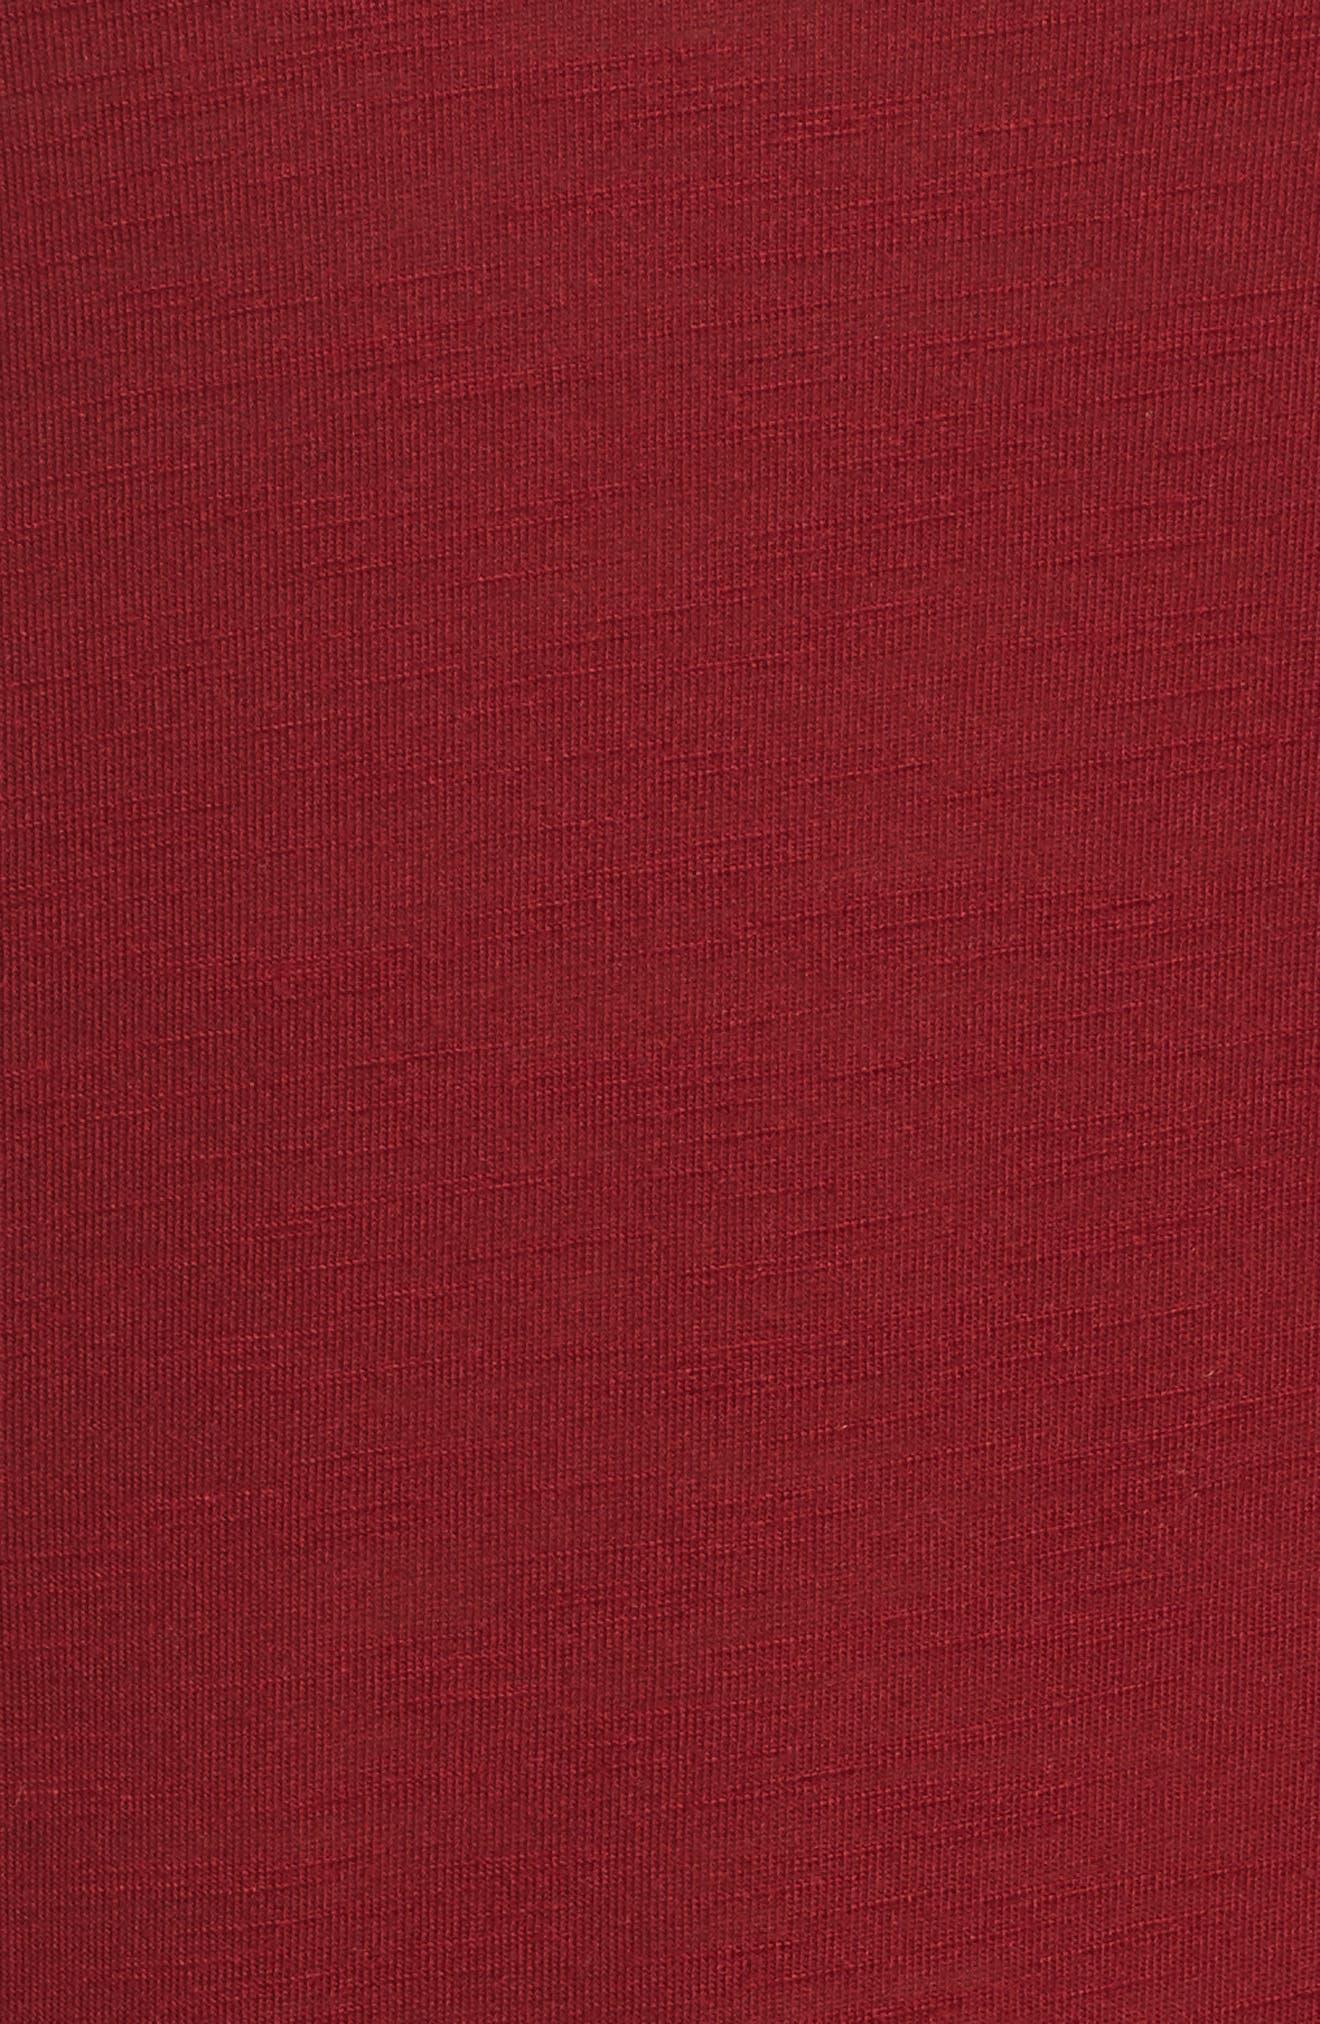 Originals Long Sleeve Tee,                             Alternate thumbnail 6, color,                             Collegiate Burgundy